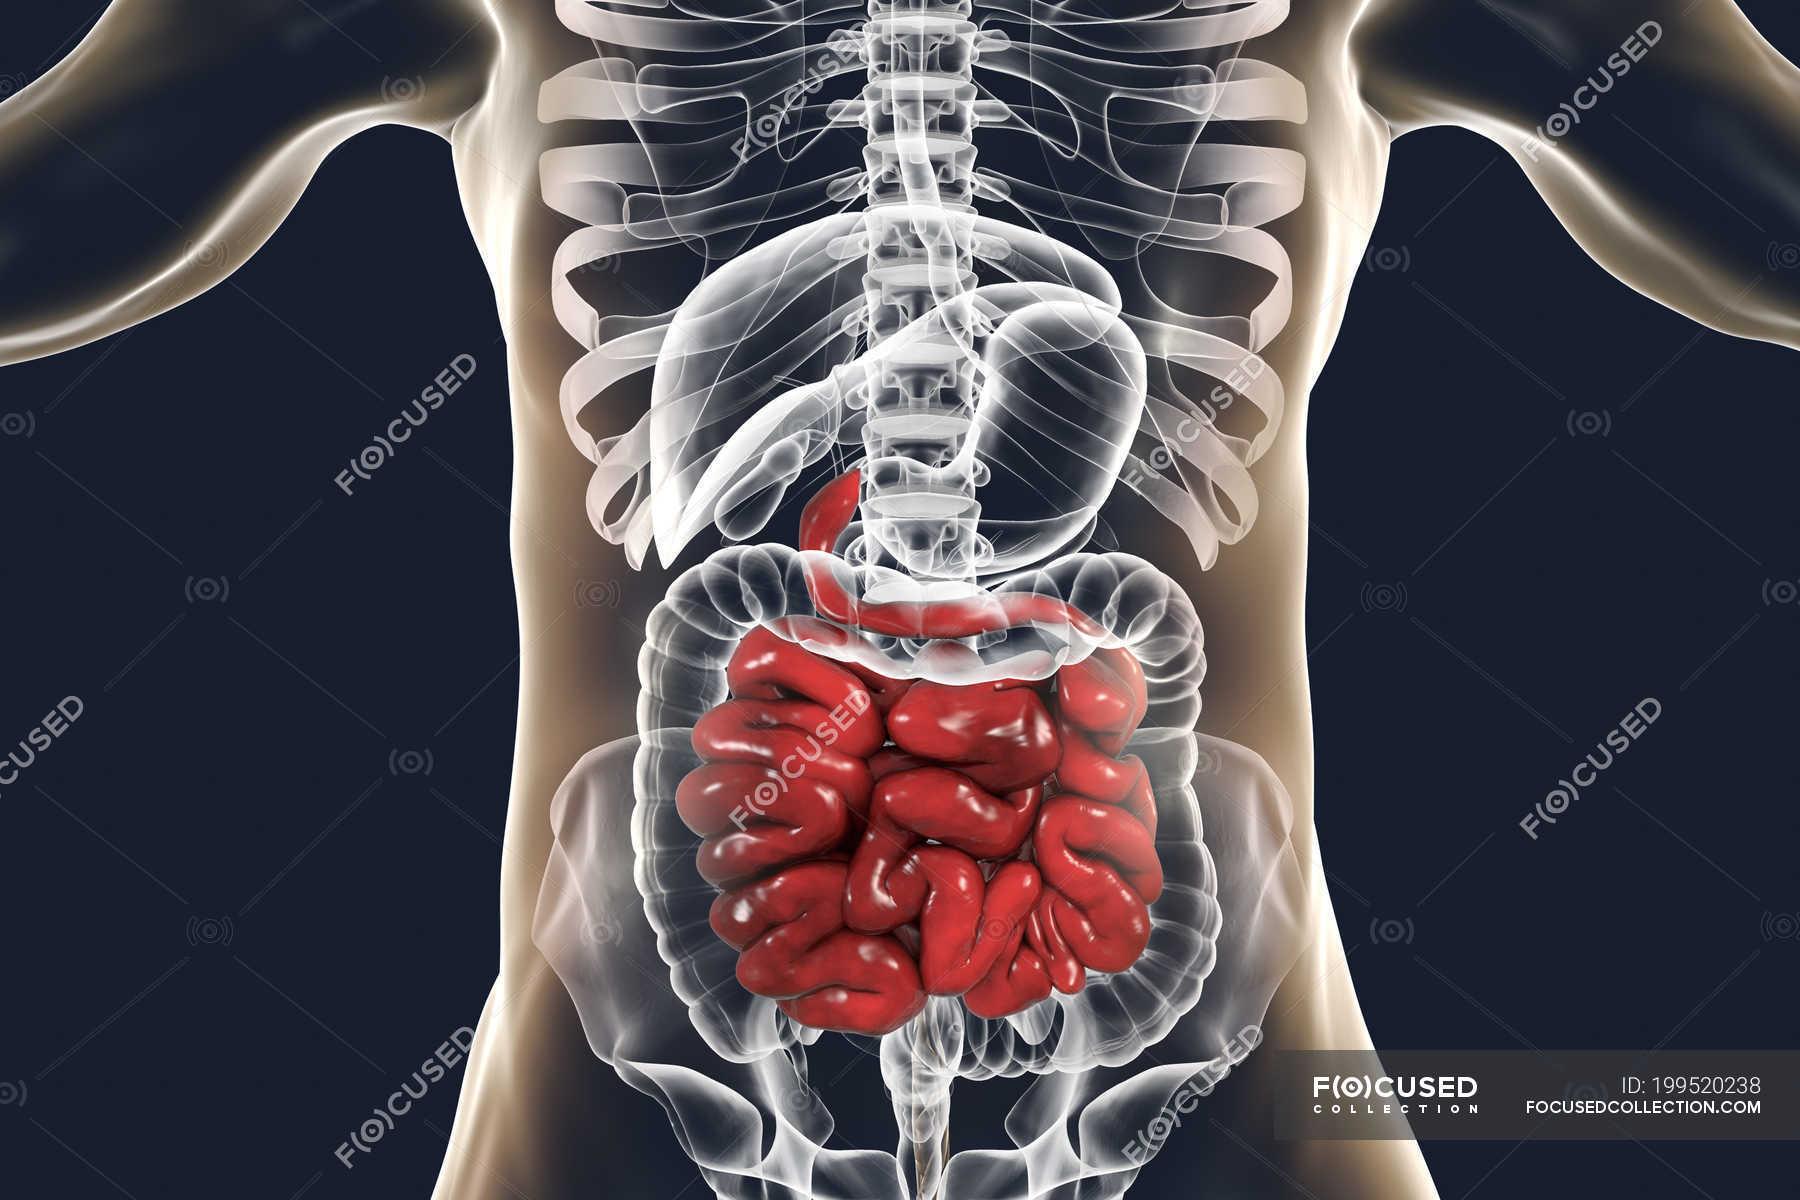 Digital Illustration Of Human Small Intestine On Plain Background